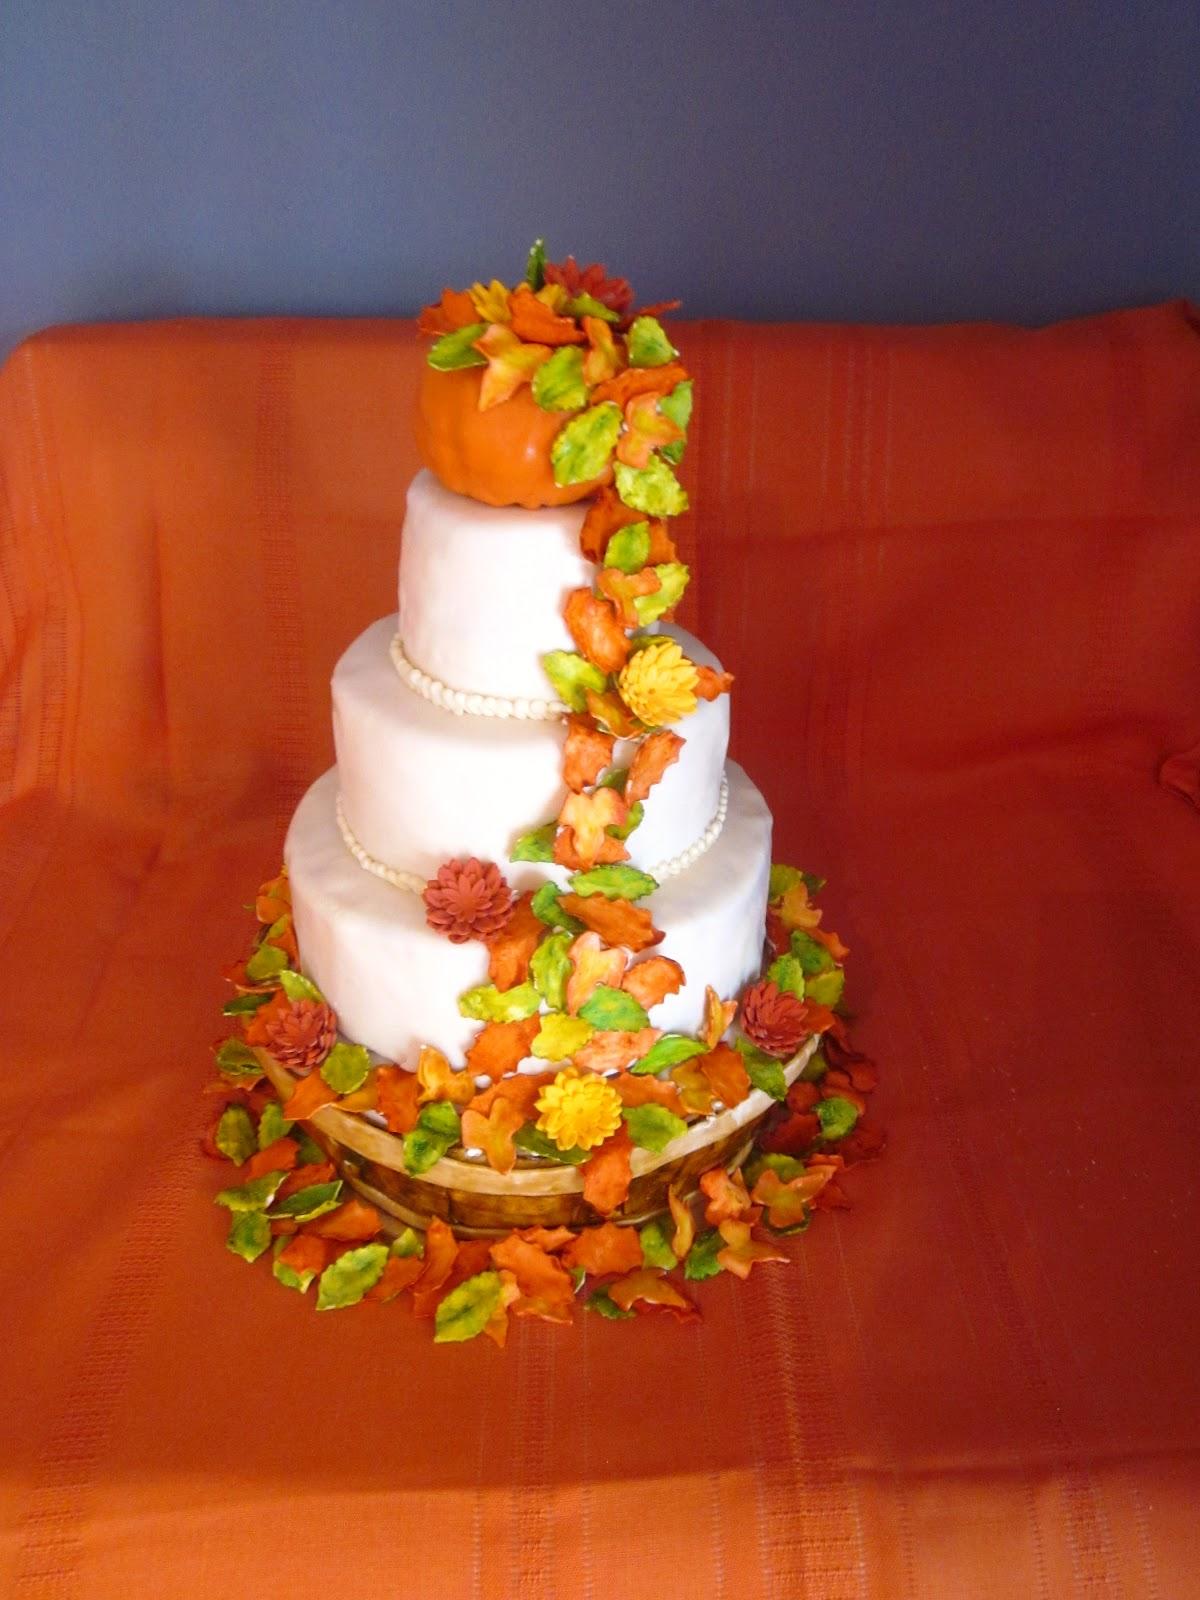 Second Generation Cake Design Fall Wedding Cake